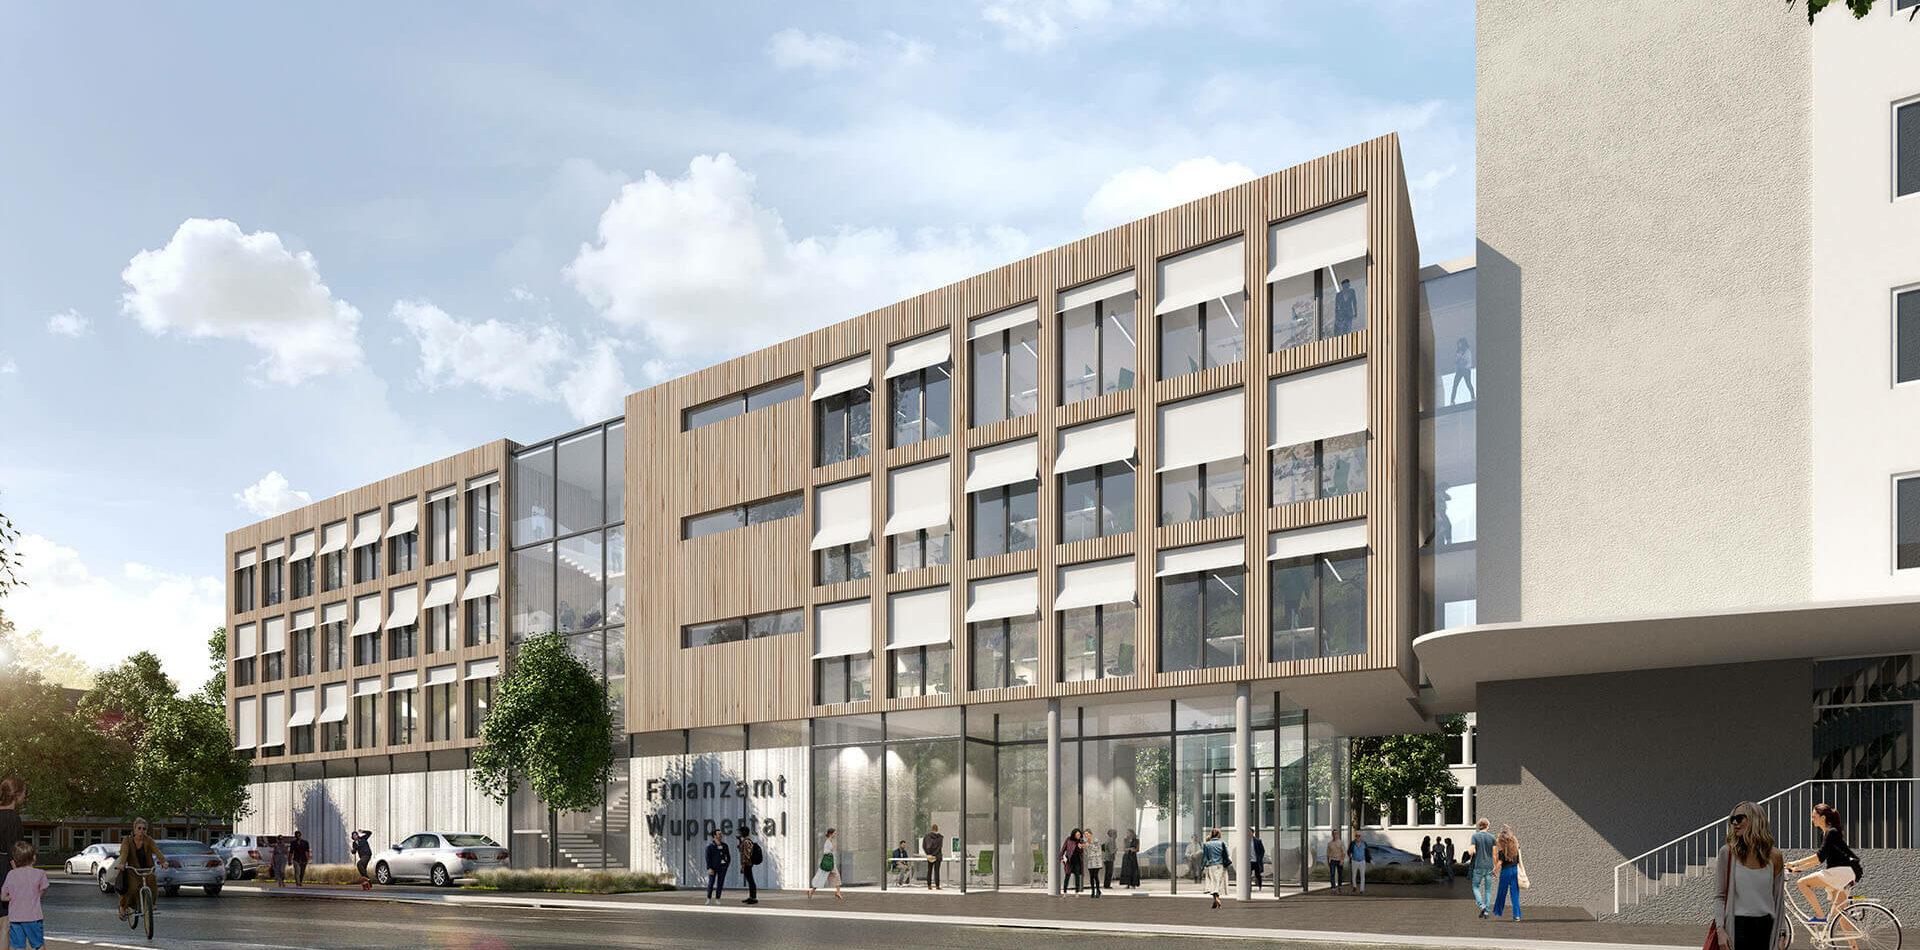 Wuppertal Finanzamt Barmen 2ter Preis Visualisierung front 4